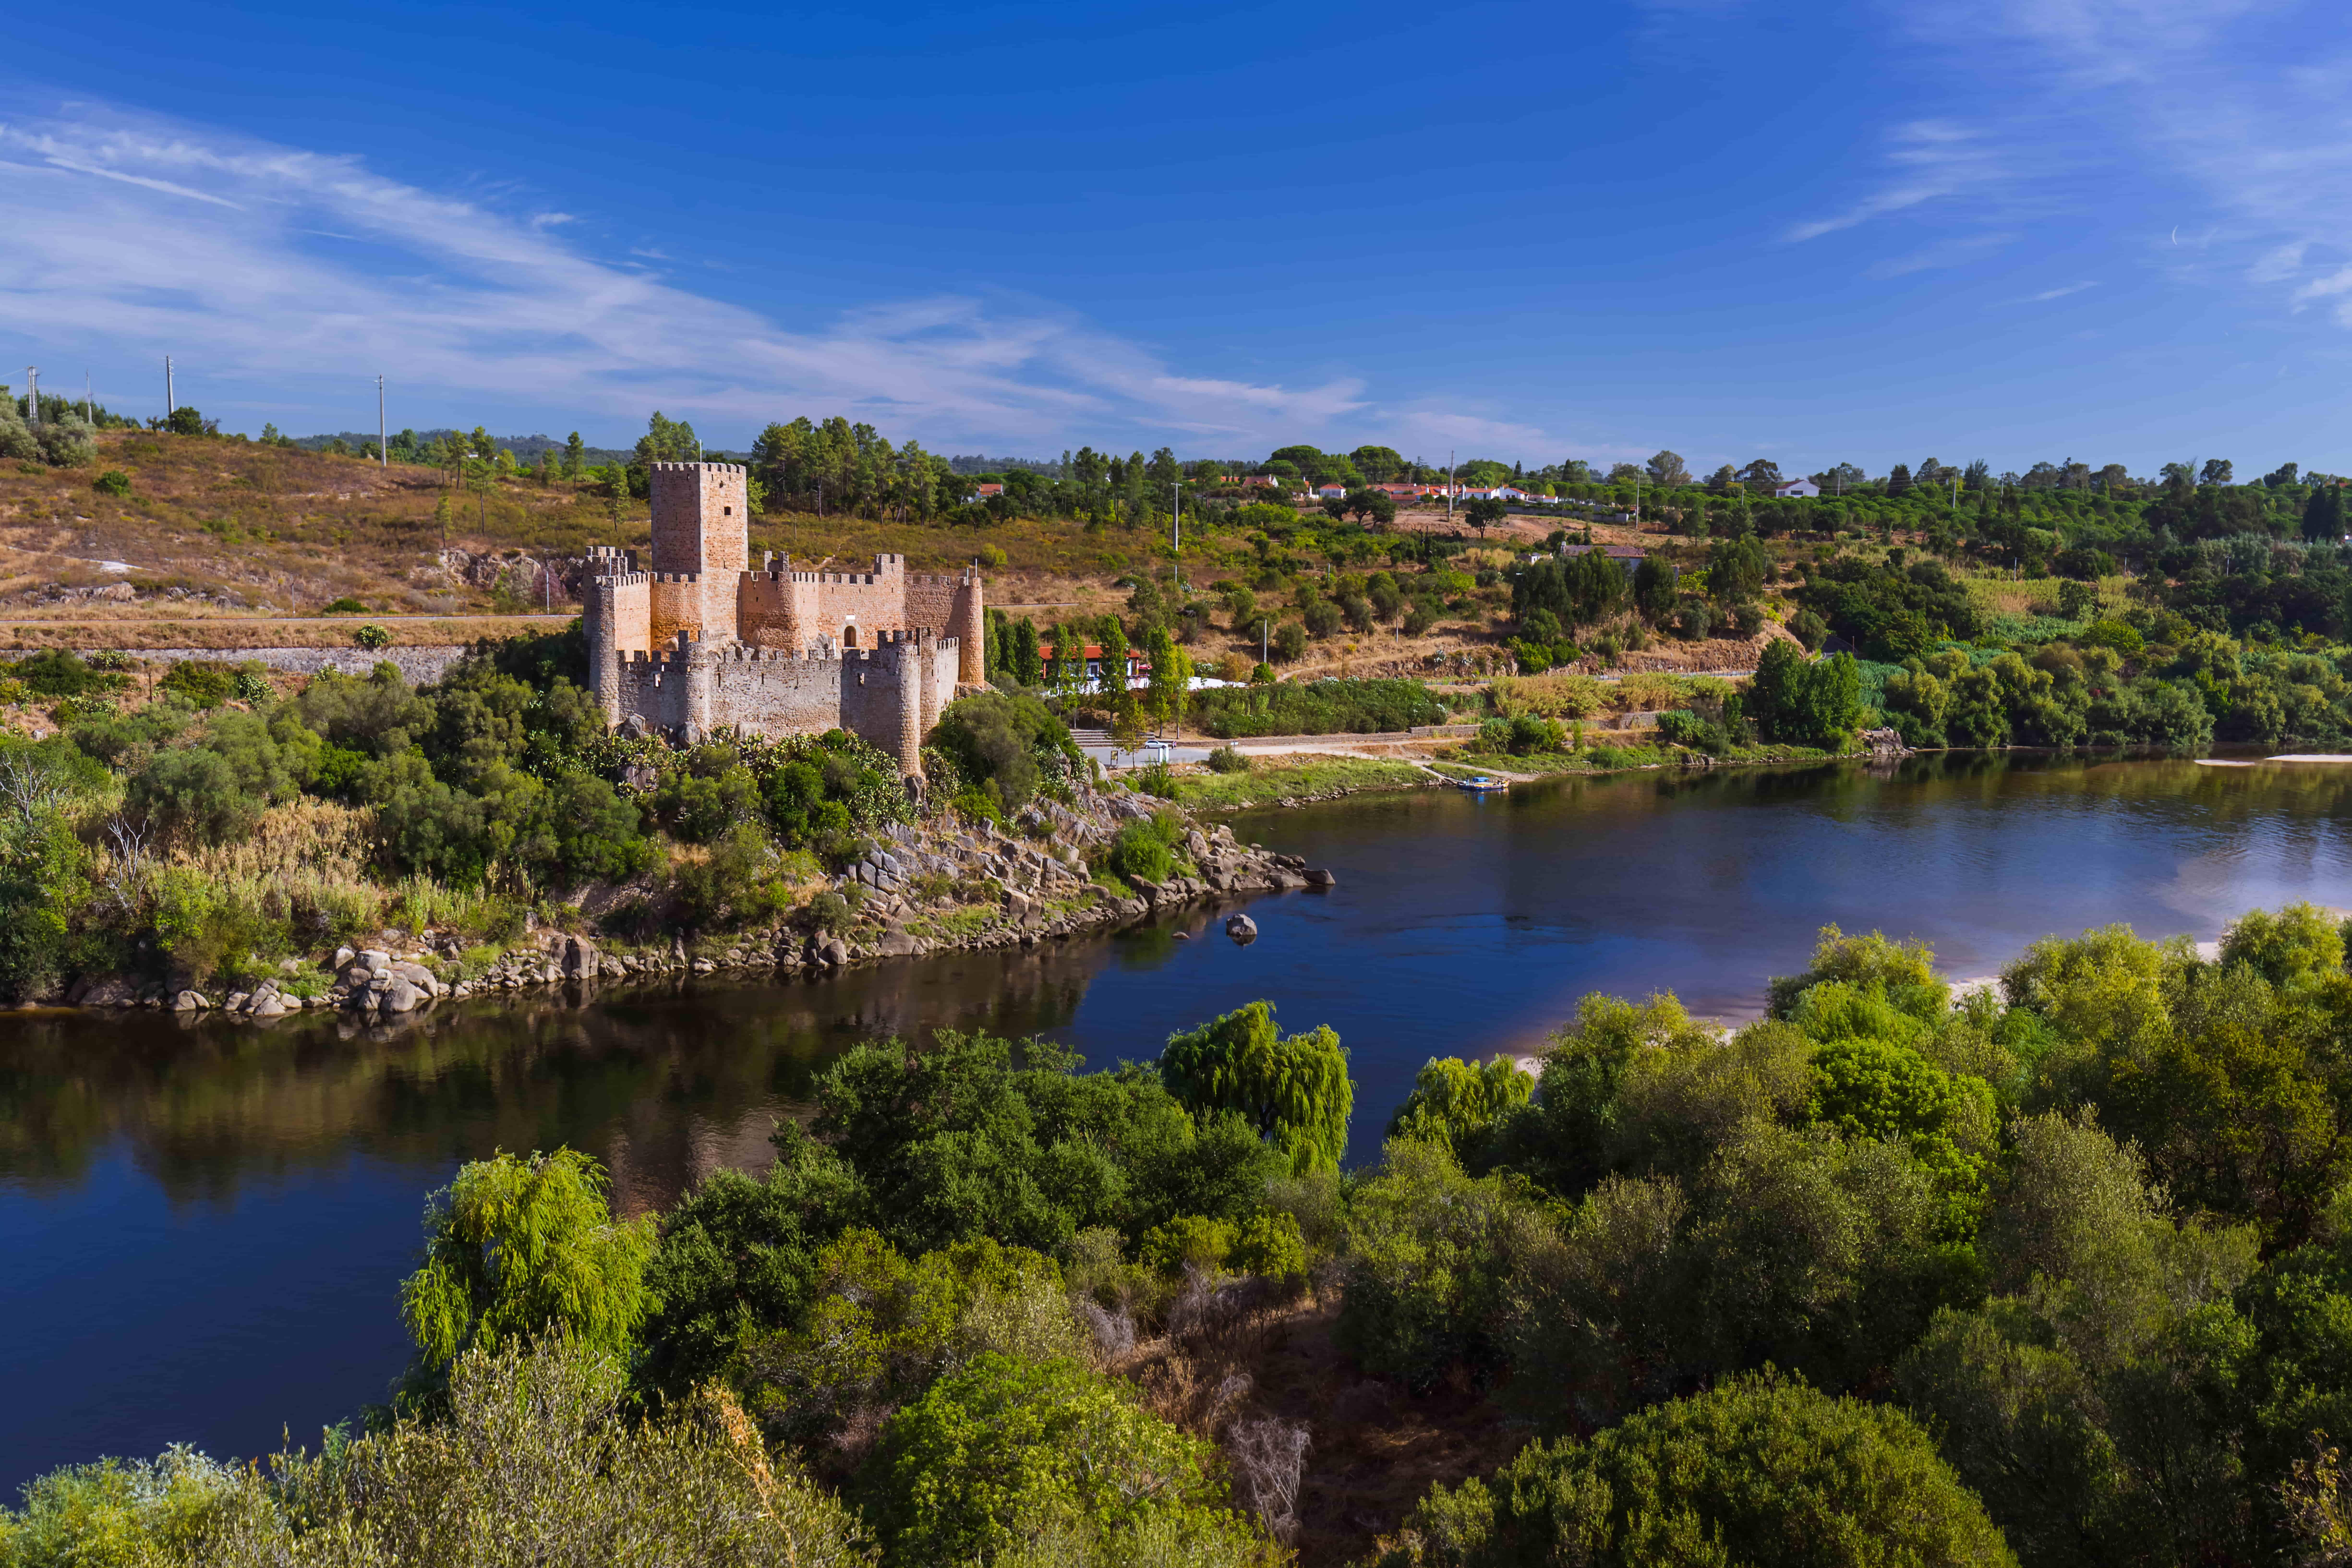 The castle of Almourol in the Tejo region